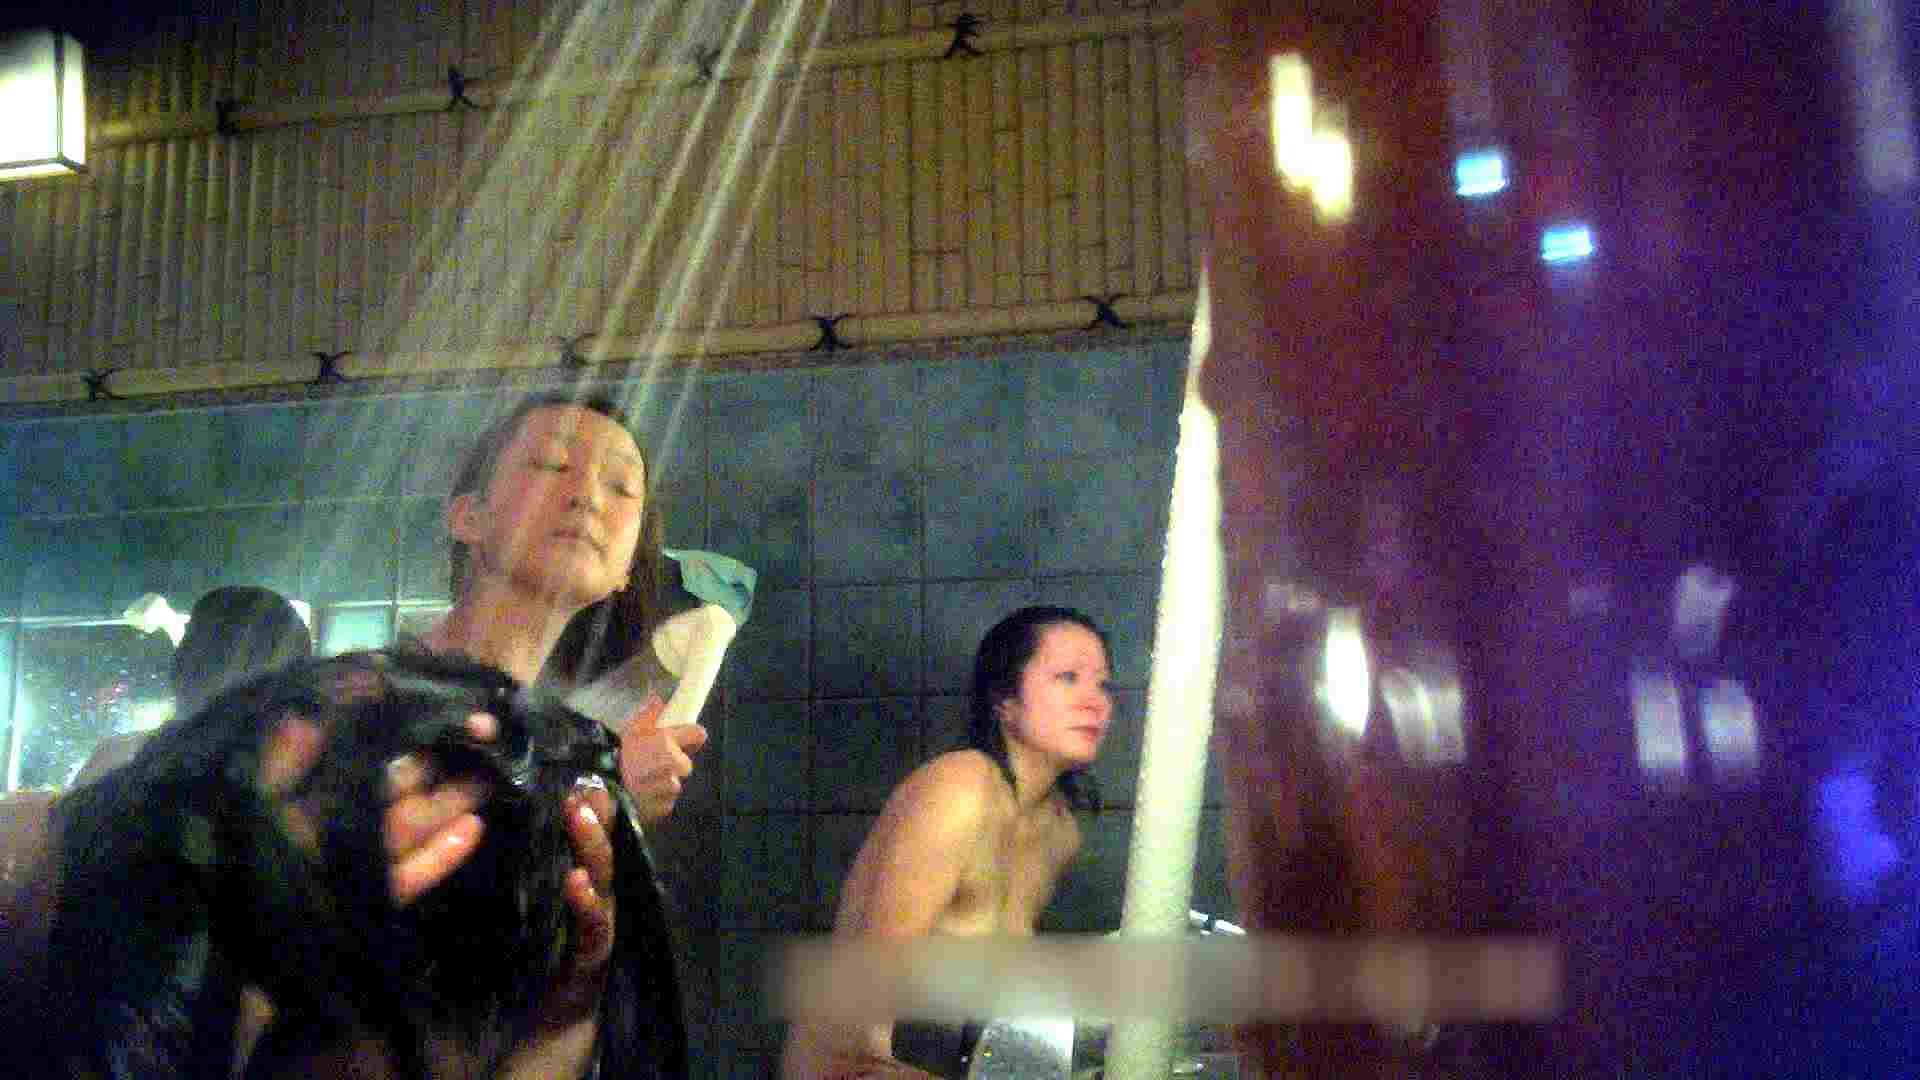 TG.12 【上等兵】いやぁ若い!ぷっちぷちギャル!でも時間短い・・・ ギャルの実態 覗きワレメ動画紹介 67pic 38